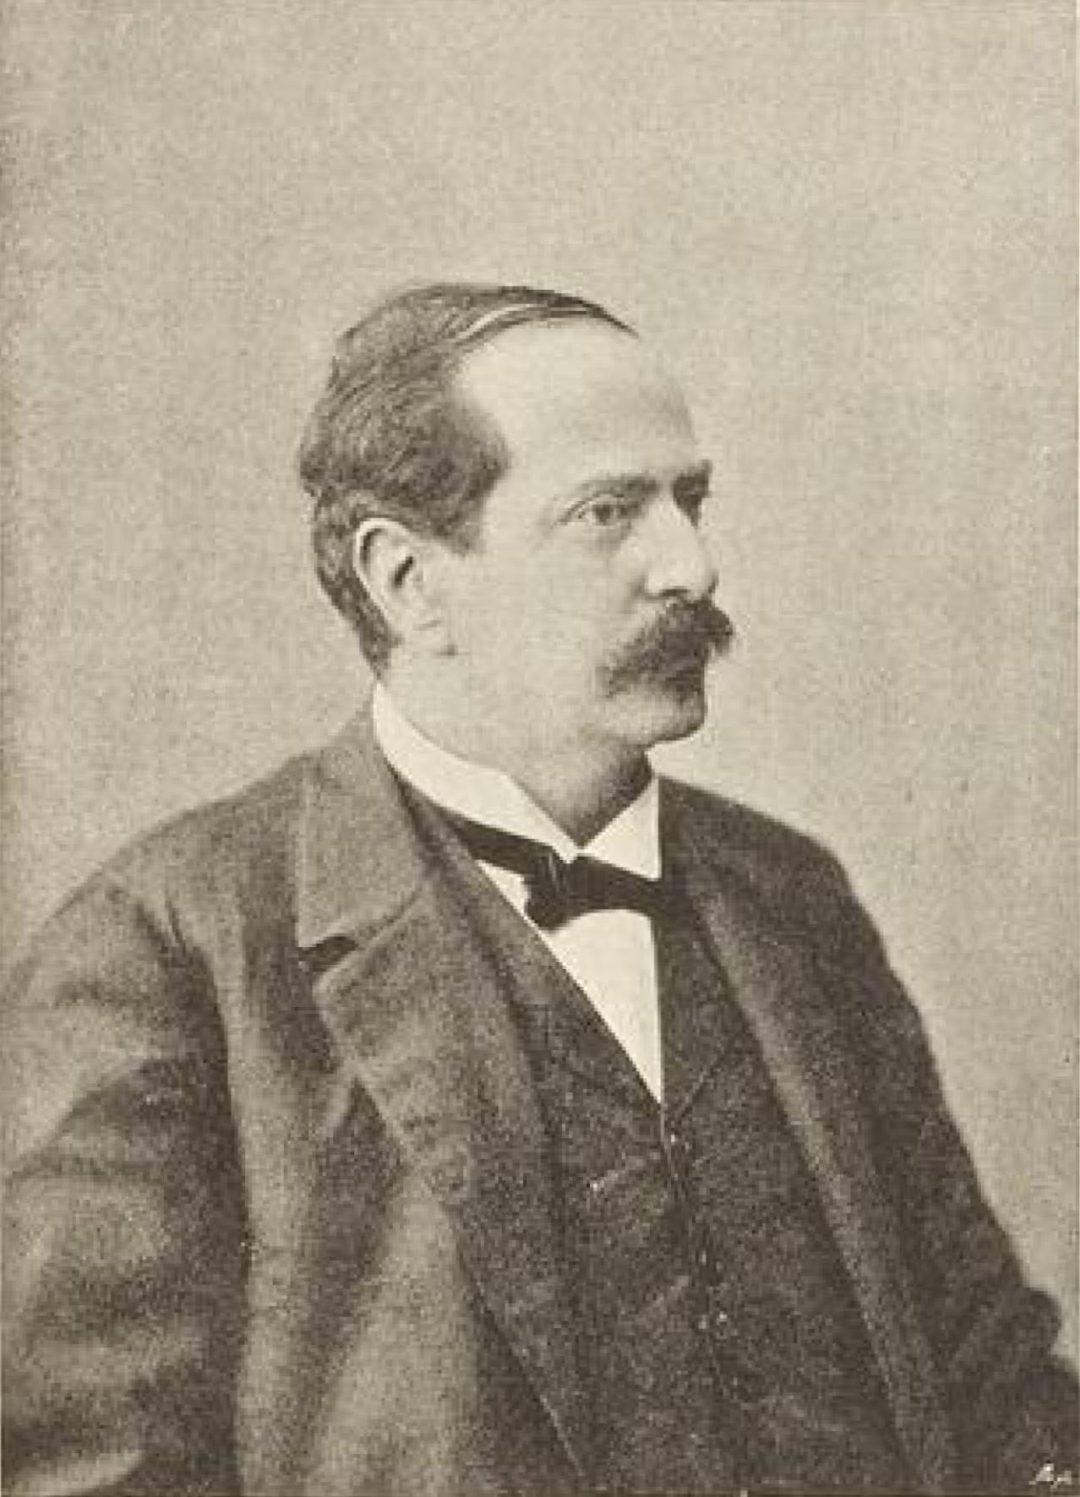 Karl-Emil Franzos